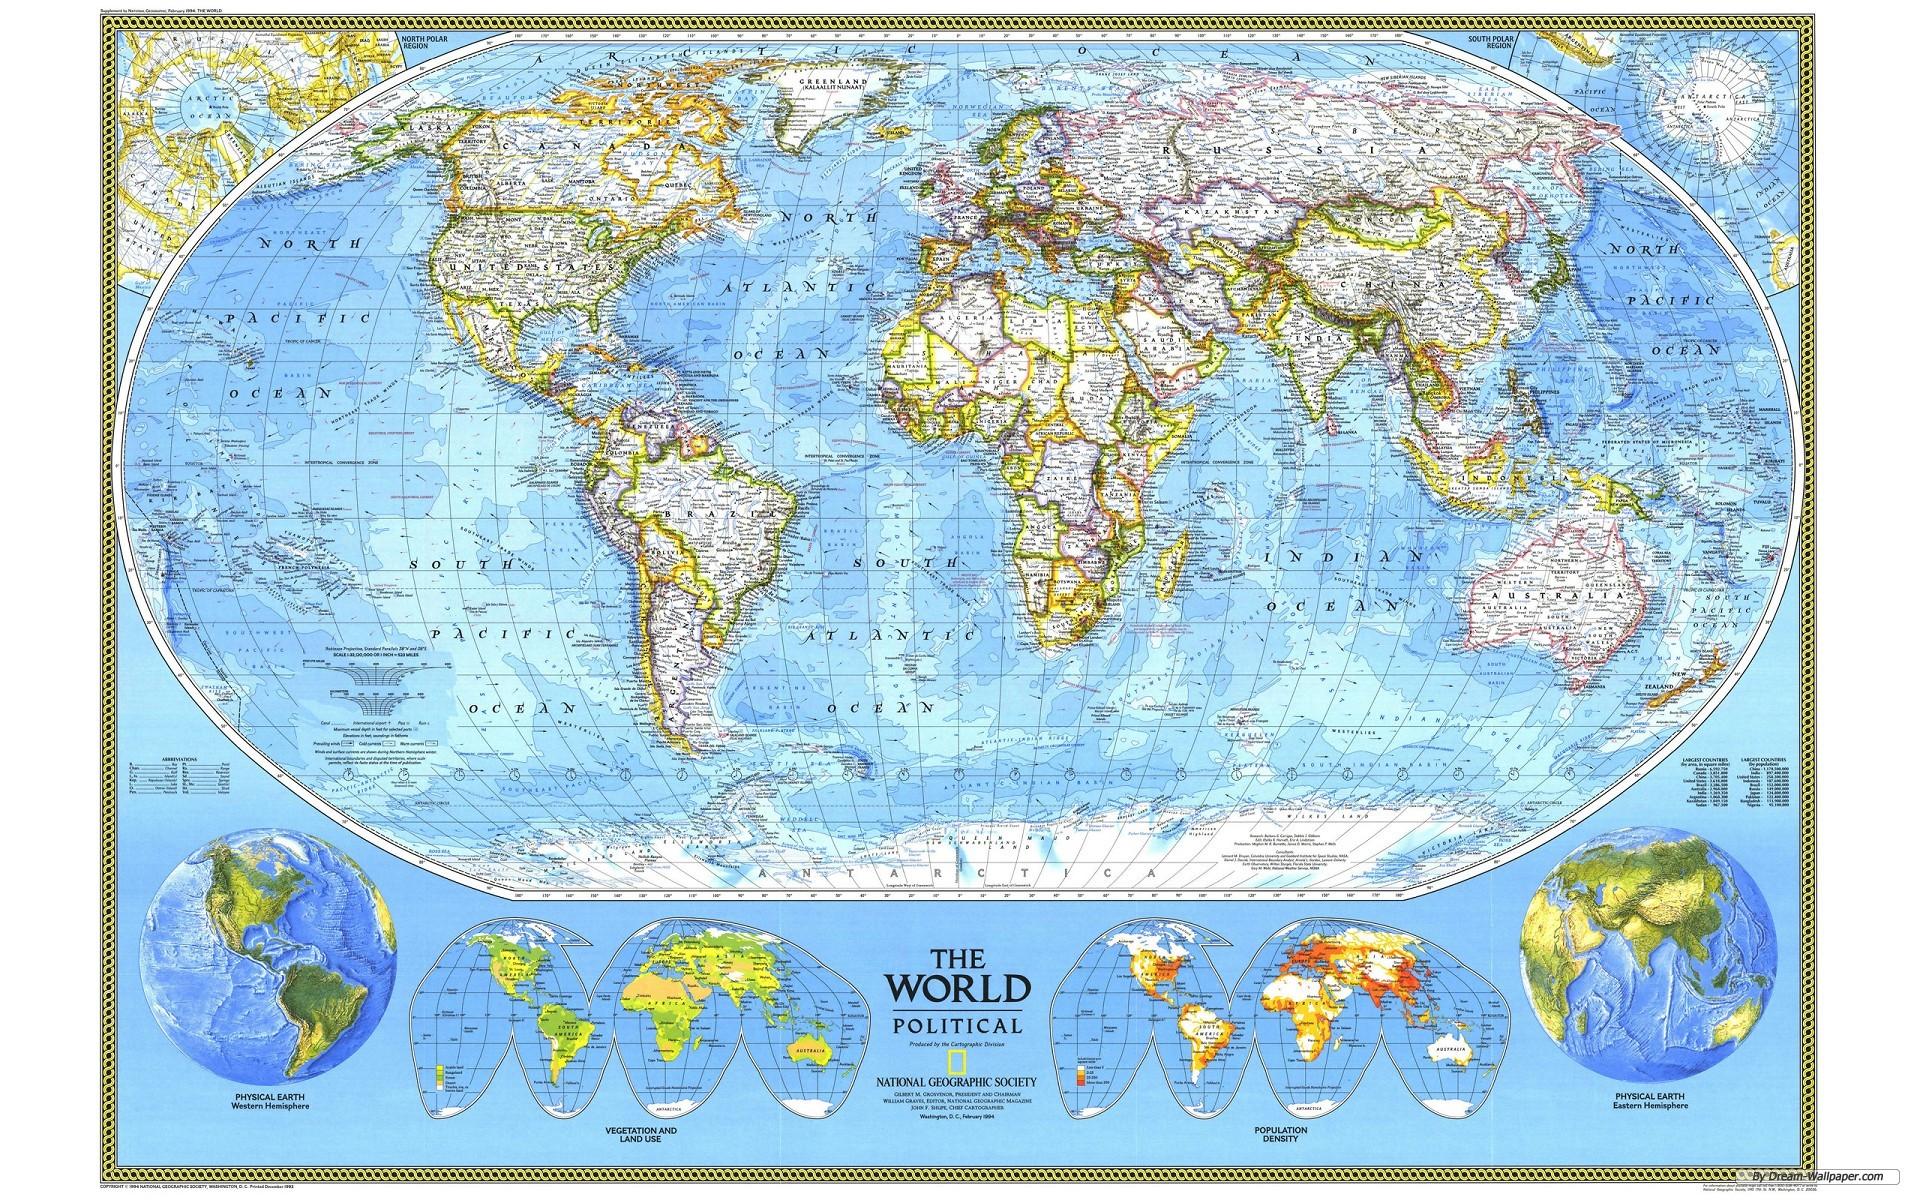 World map wallpapers wallpapersafari wallpaper desktop wallpapers world travel 1920x1200 1920x1200 gumiabroncs Choice Image